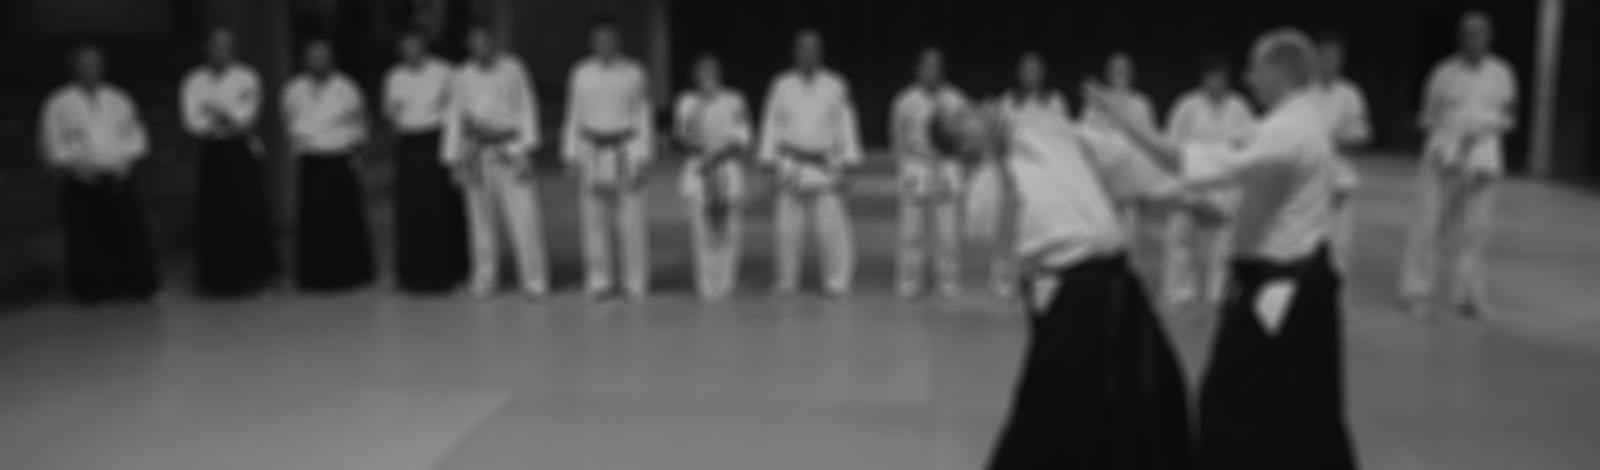 zelfverdediging-hakkoryu-jujutsu-leuven